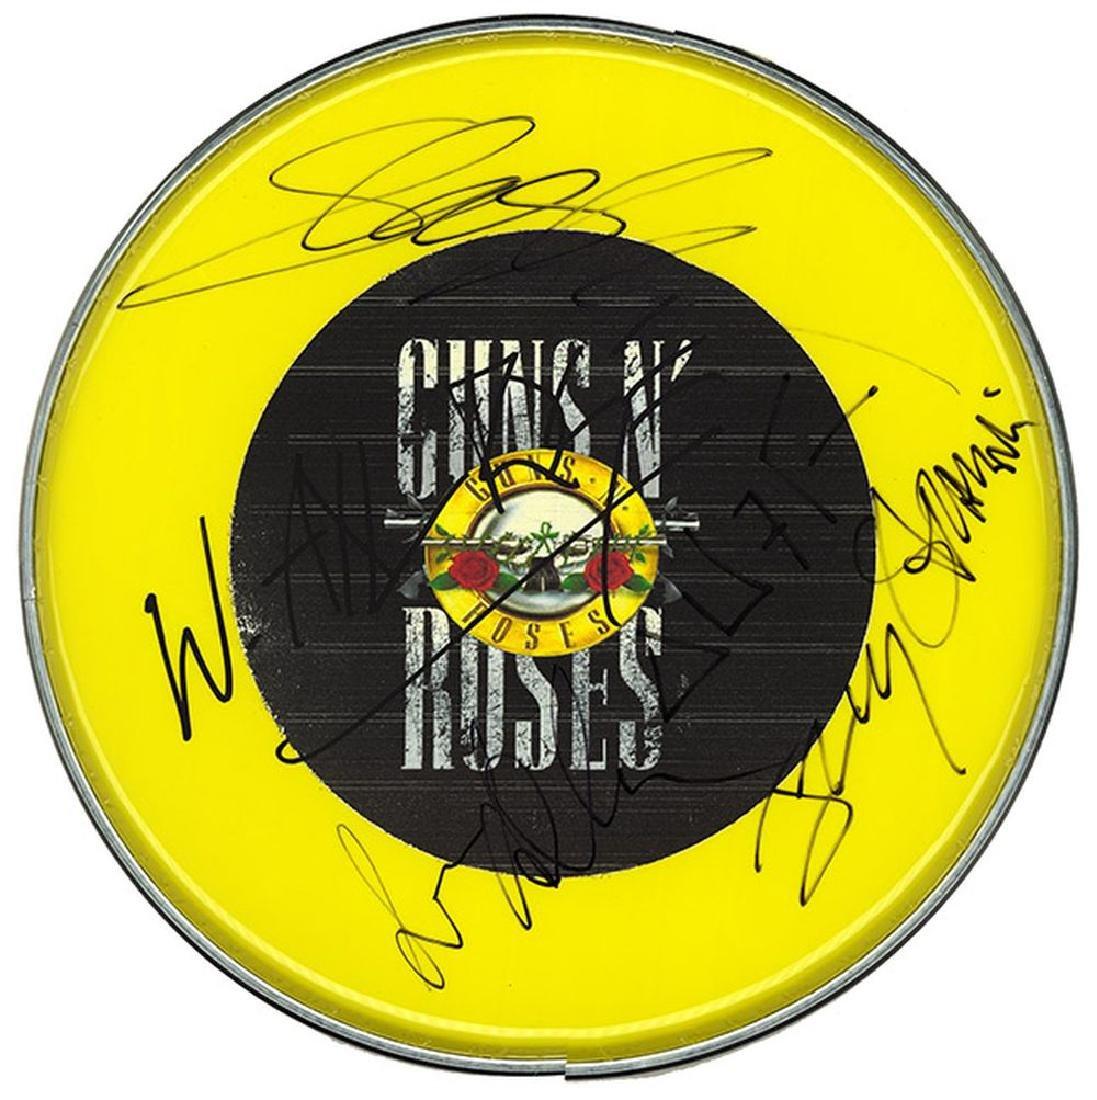 Guns N' Roses Signed Drum Head